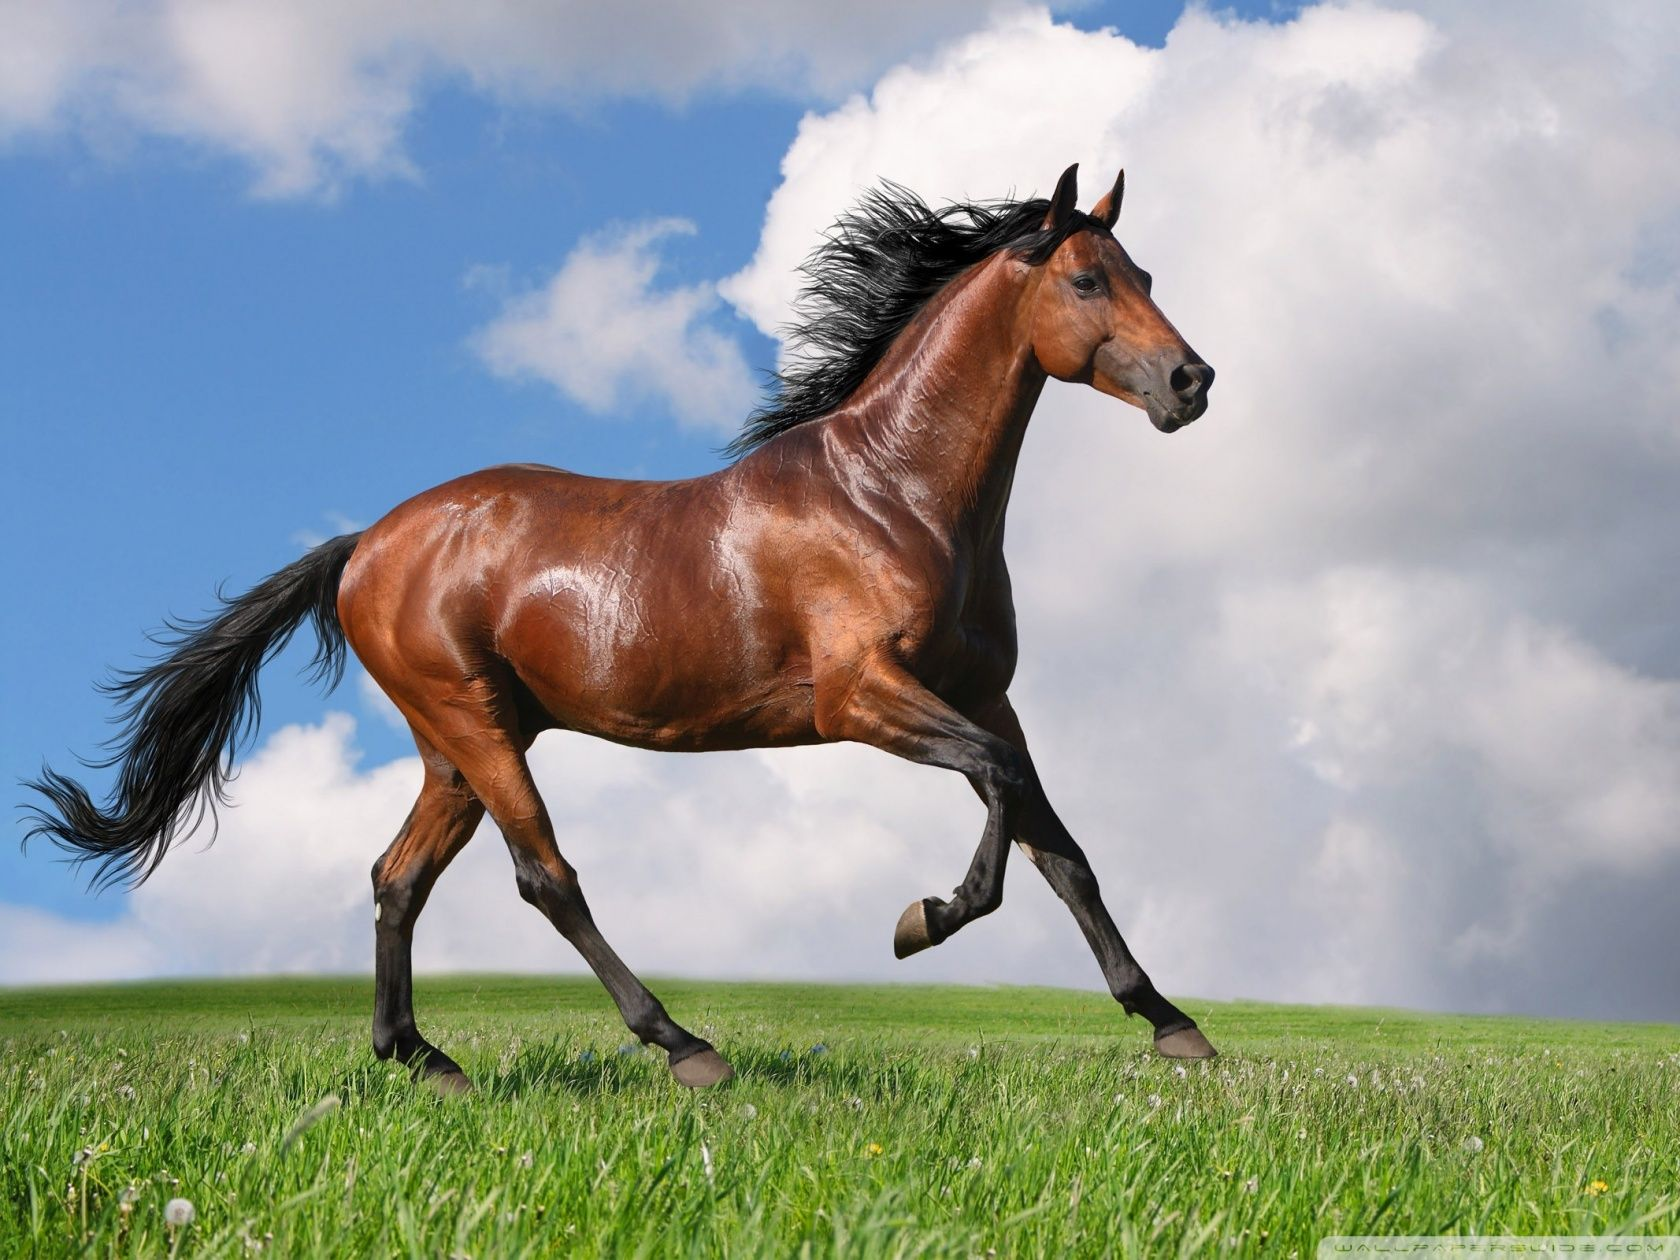 Download Wallpaper Horse High Definition - c997b56e879761c085dd97f96d7a214a  Image_223488.jpg